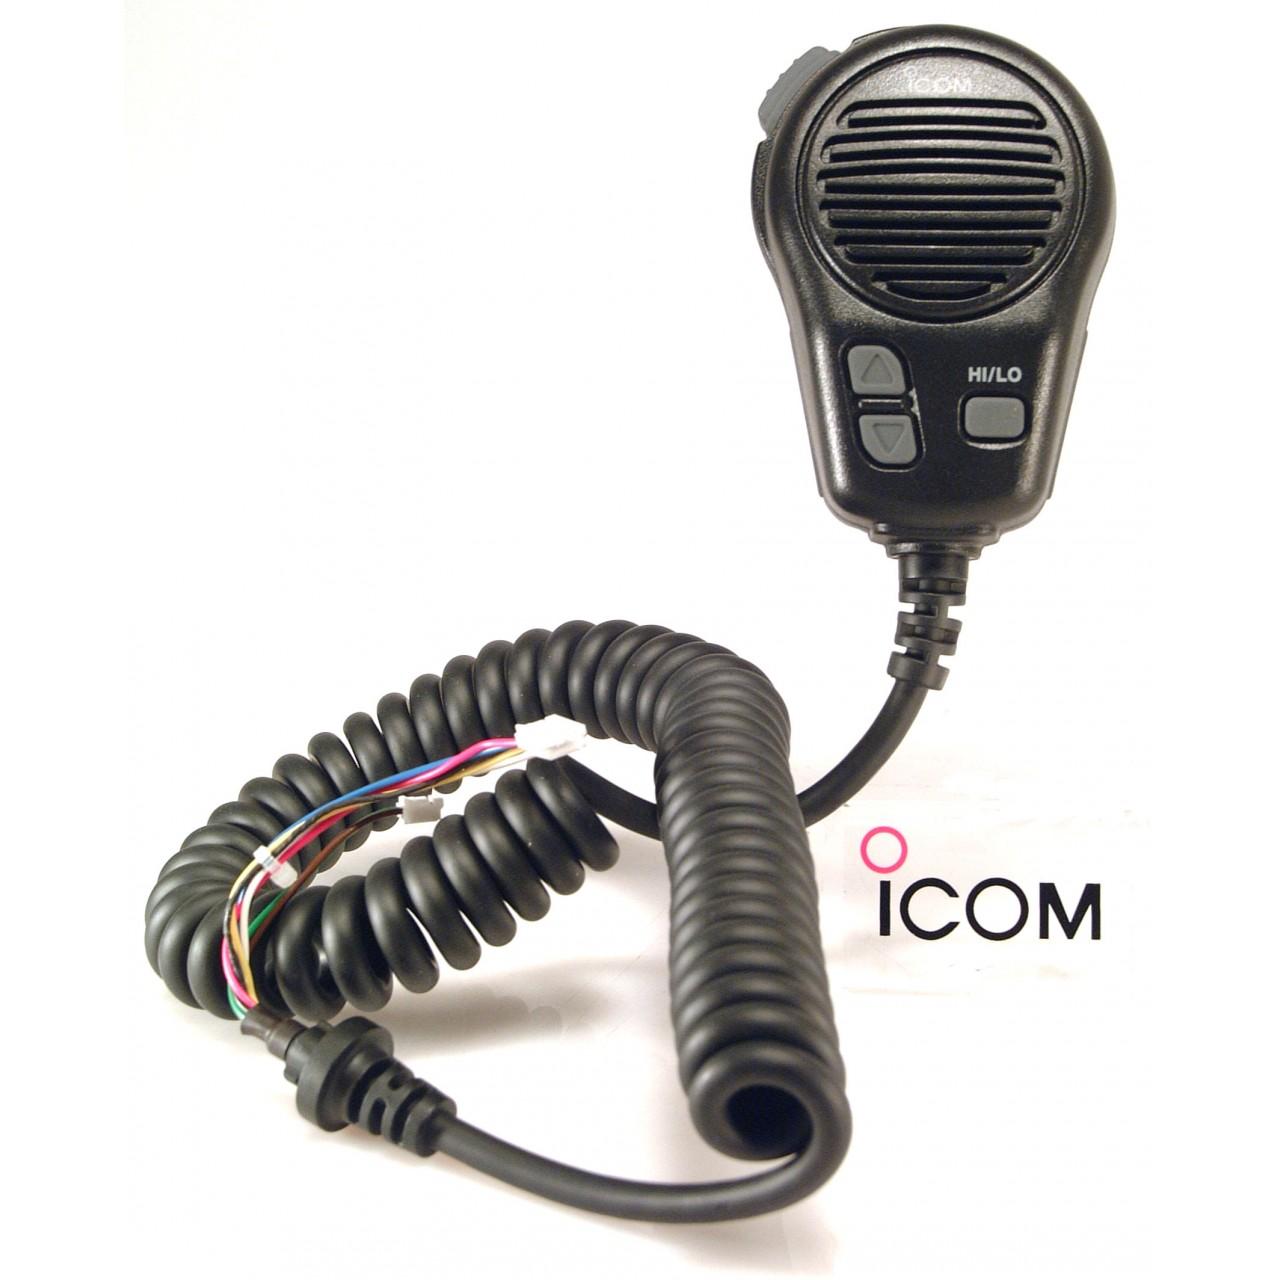 HM-126B Microphones - ICOM